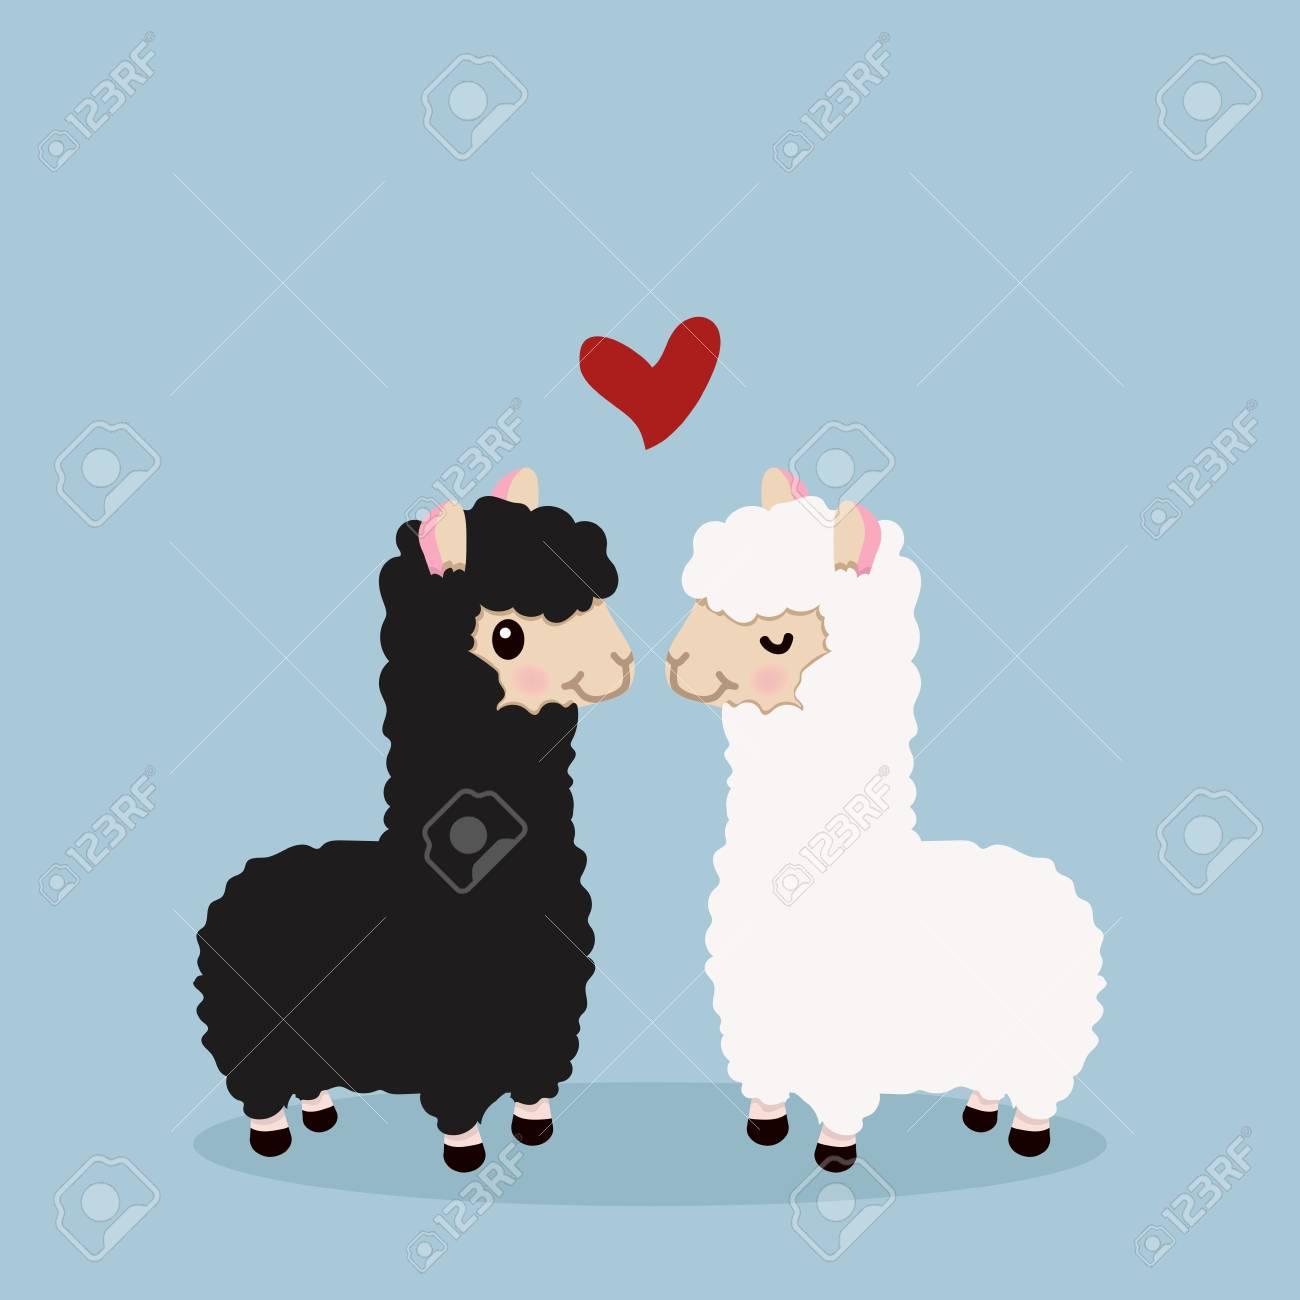 Alpaca couple in love - 91669599